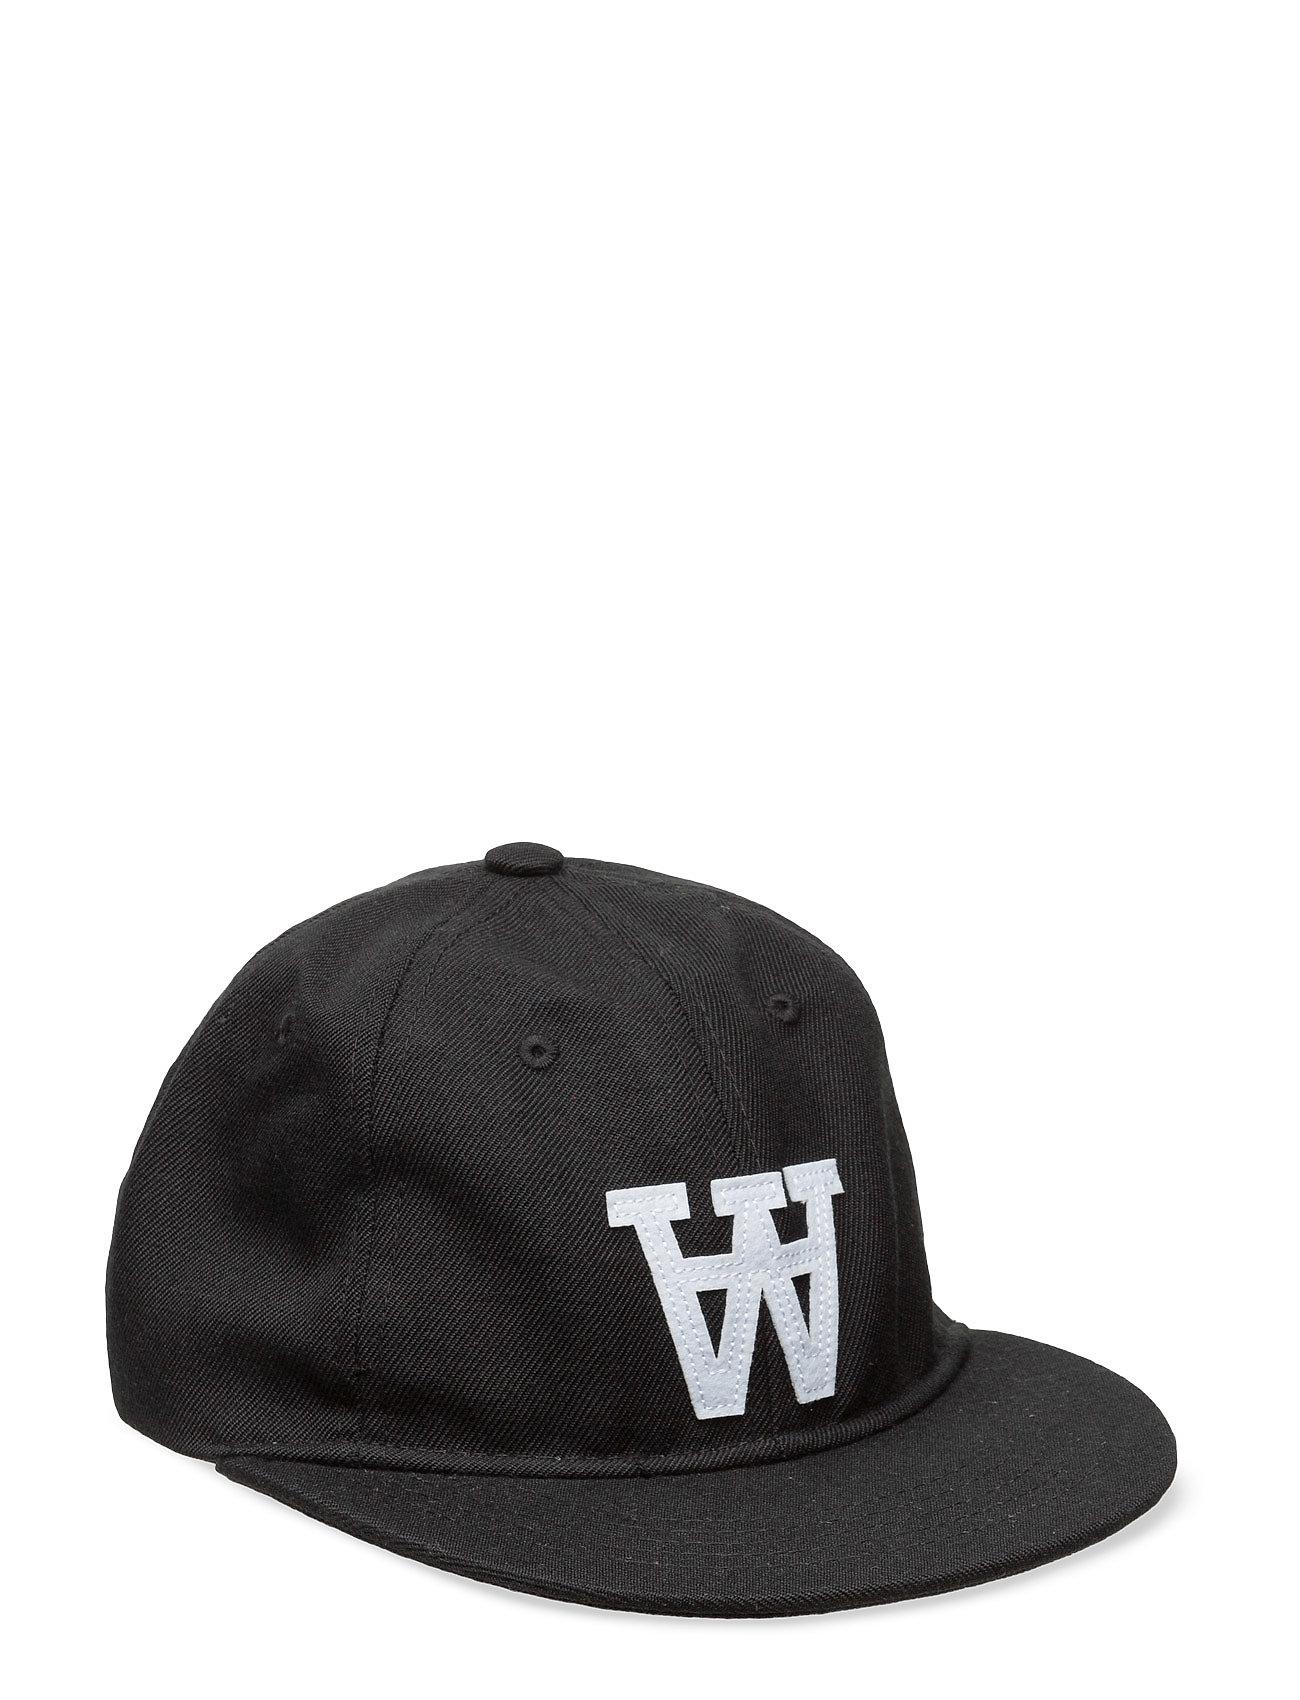 Baseball Cap Wood Wood Kasketter til Herrer i